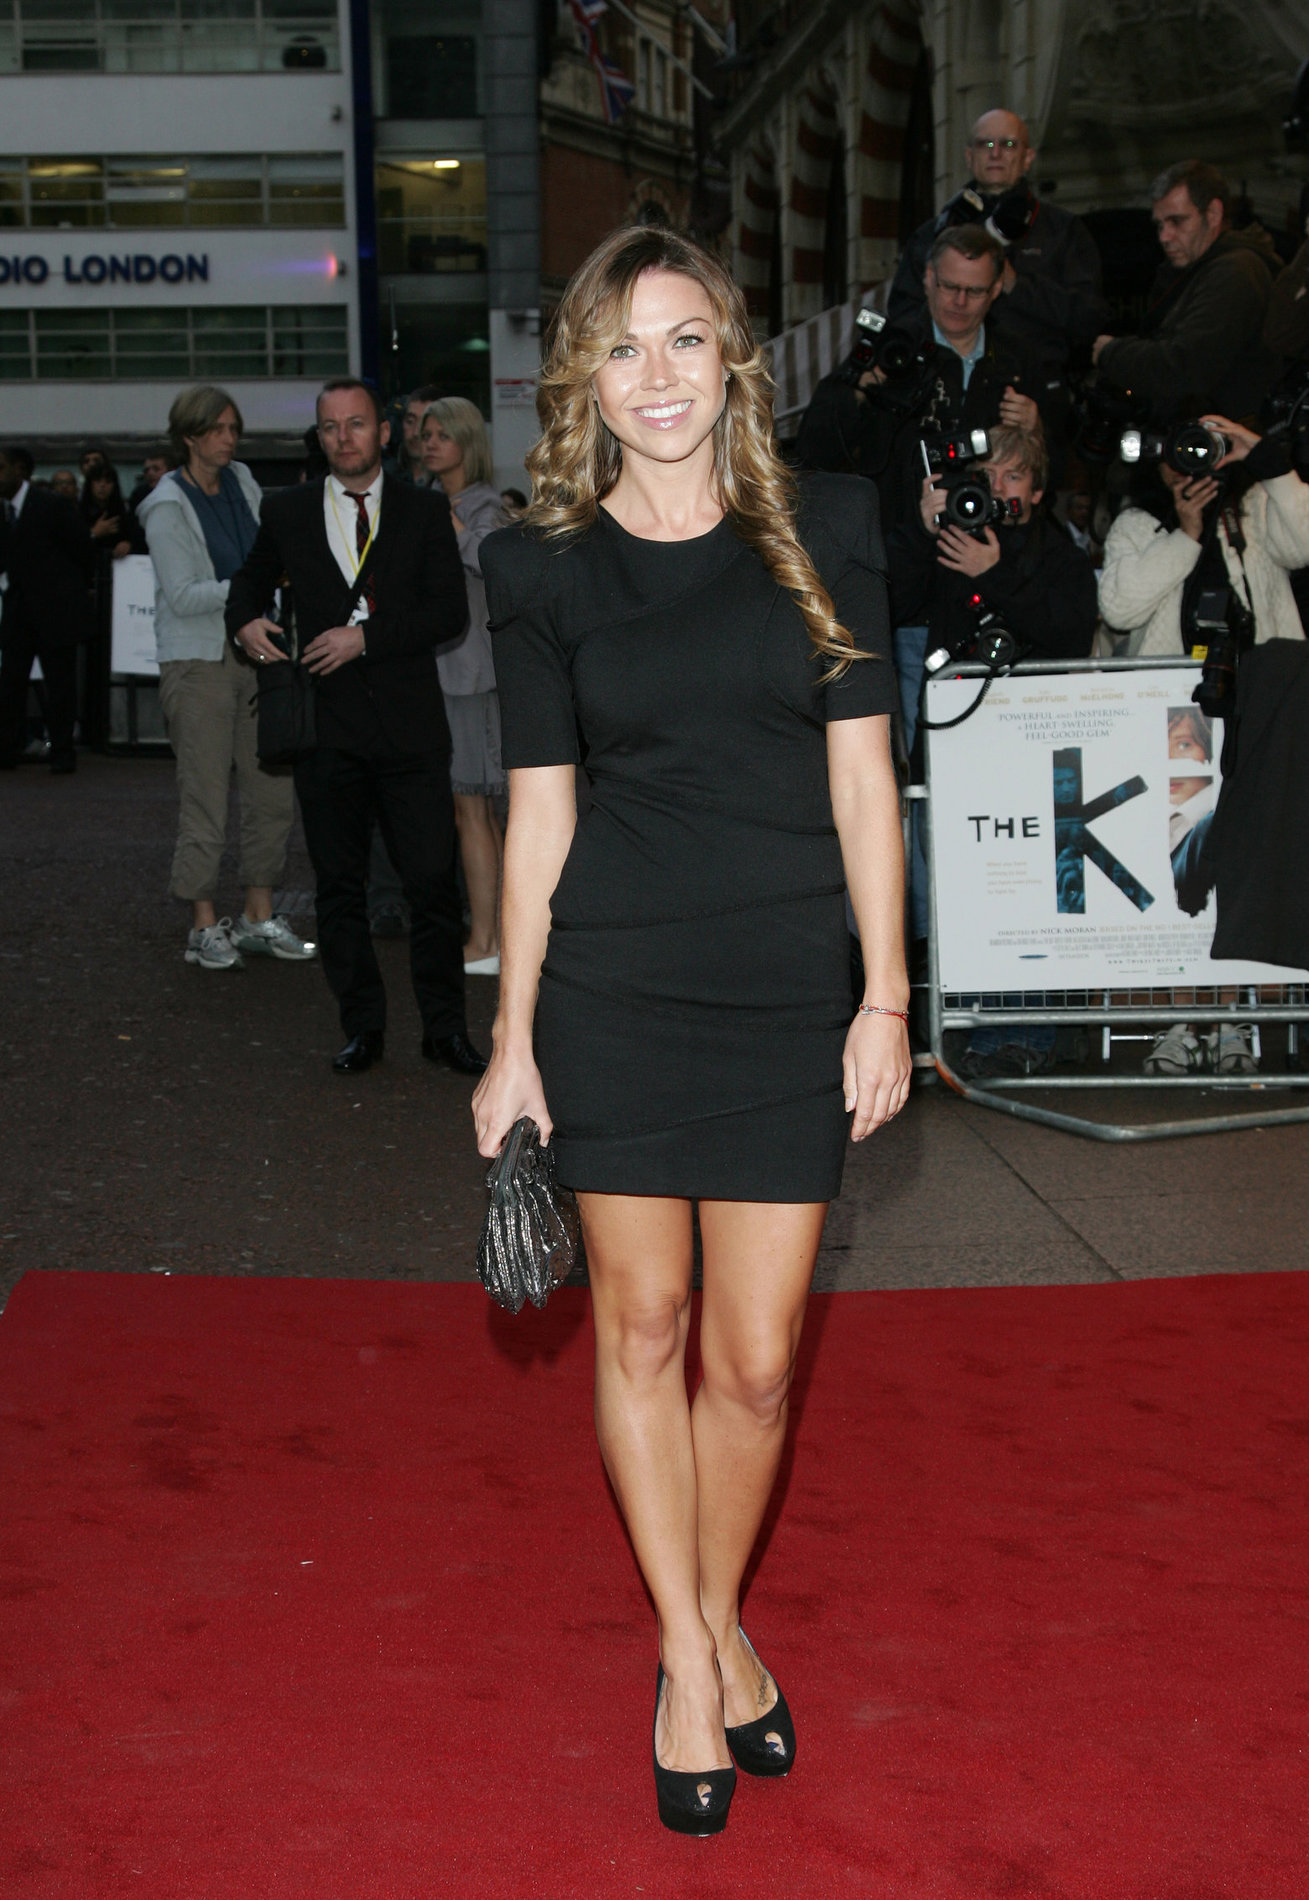 Adele Silva at The Kid premiere in London on September 15, 2010